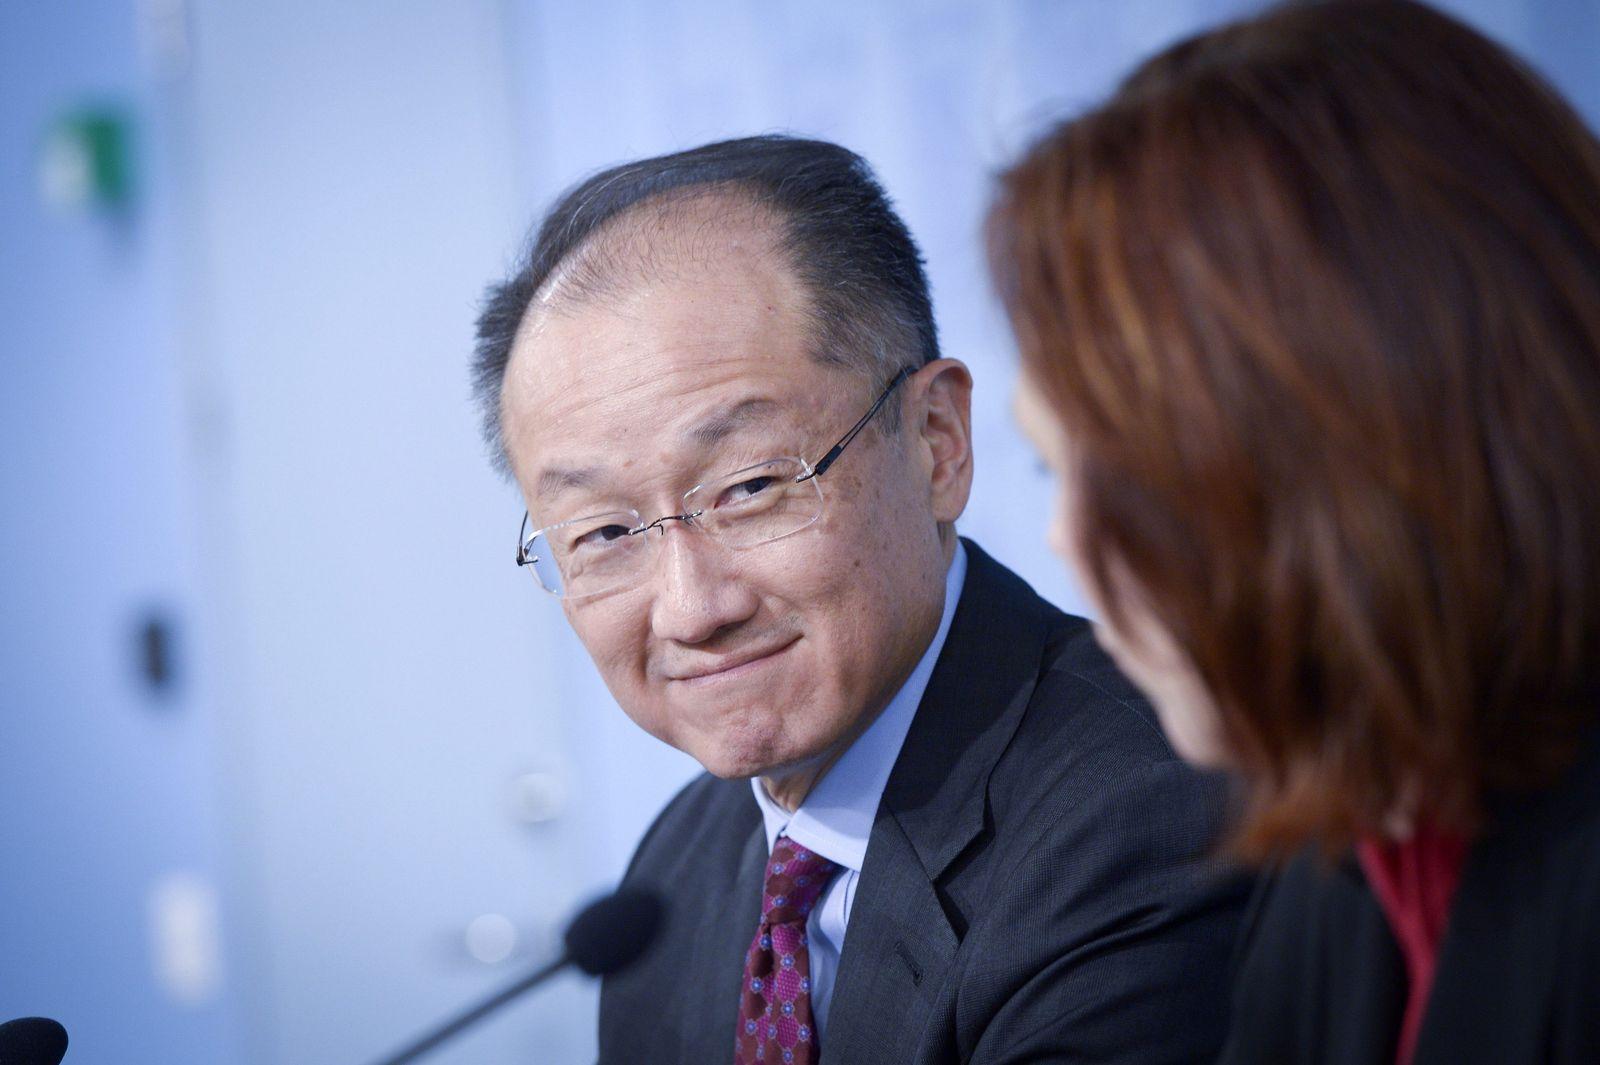 World Bank Group President Jim Yong Kim in Helsinki